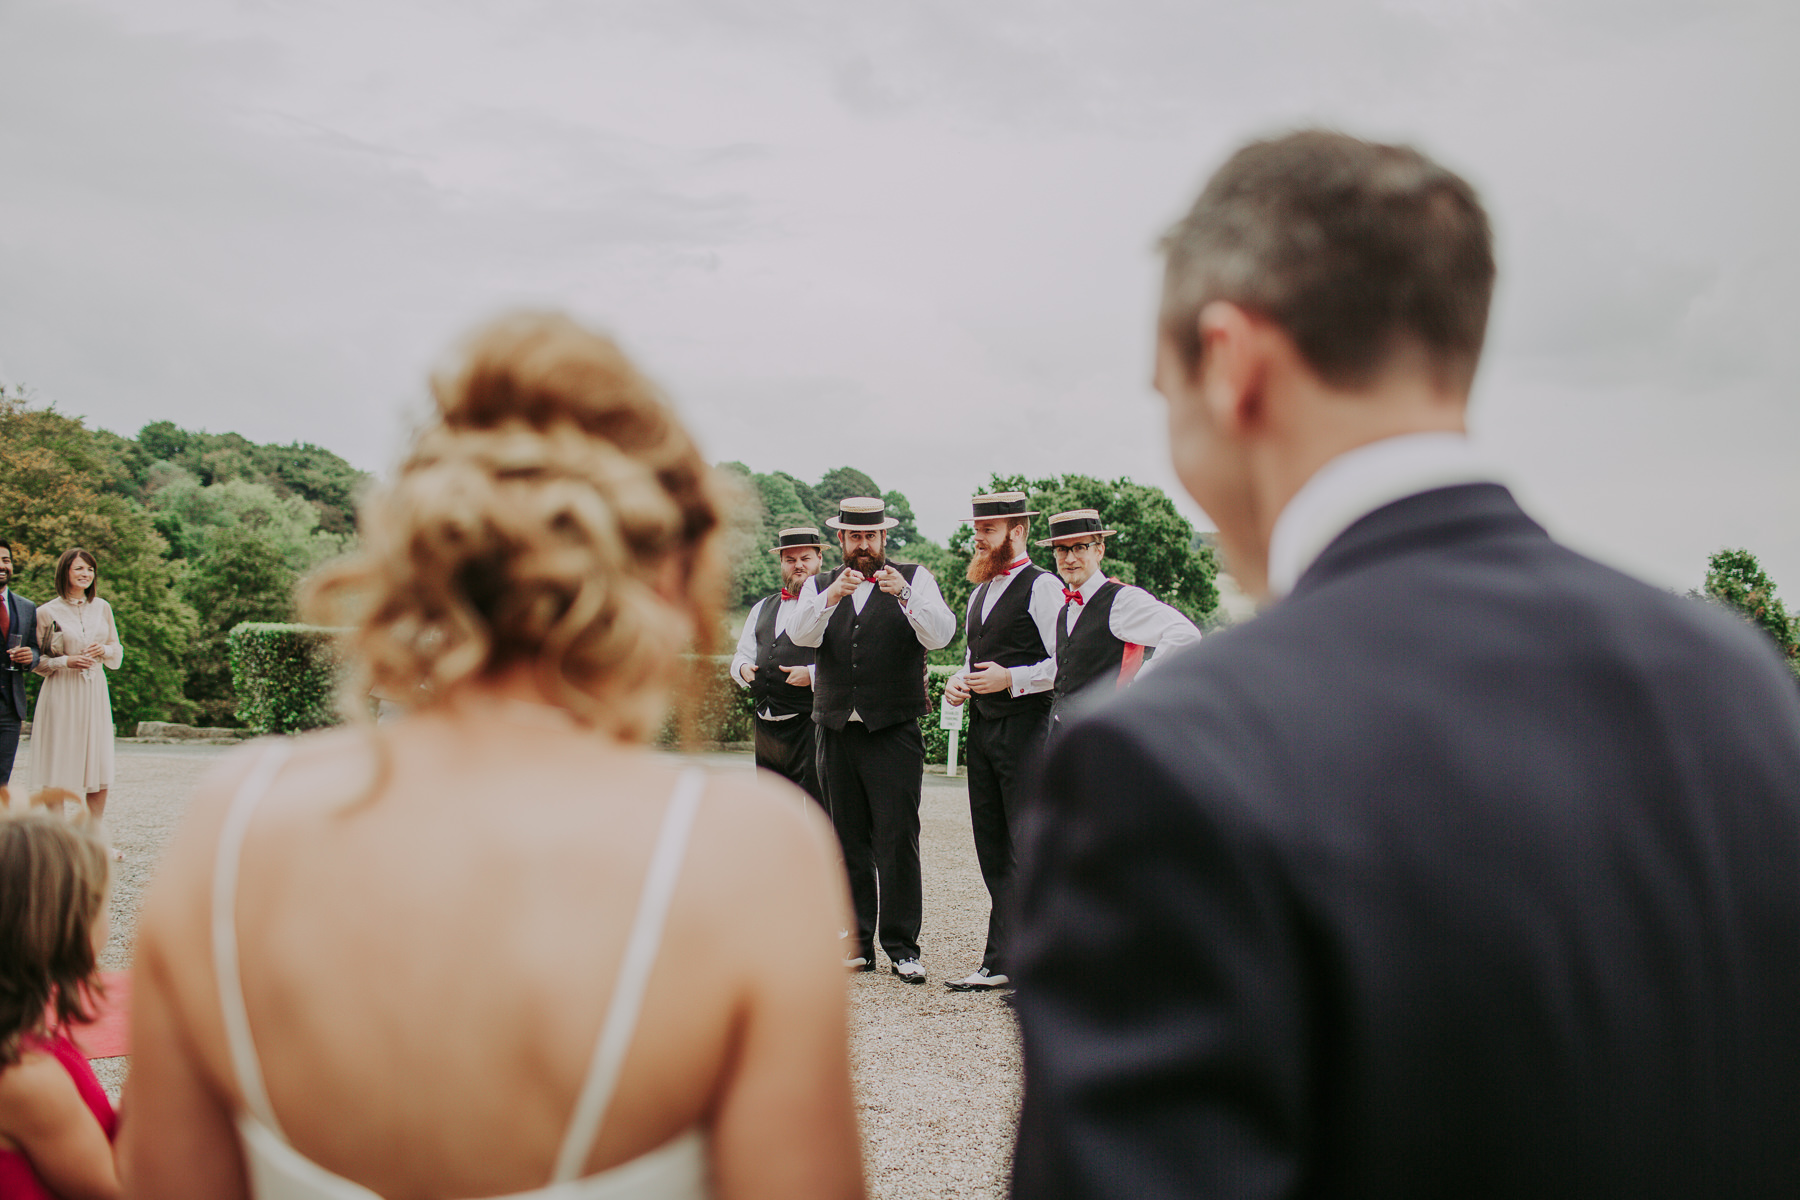 Meg & Jon | Wood Hall Hotel Wedding 71